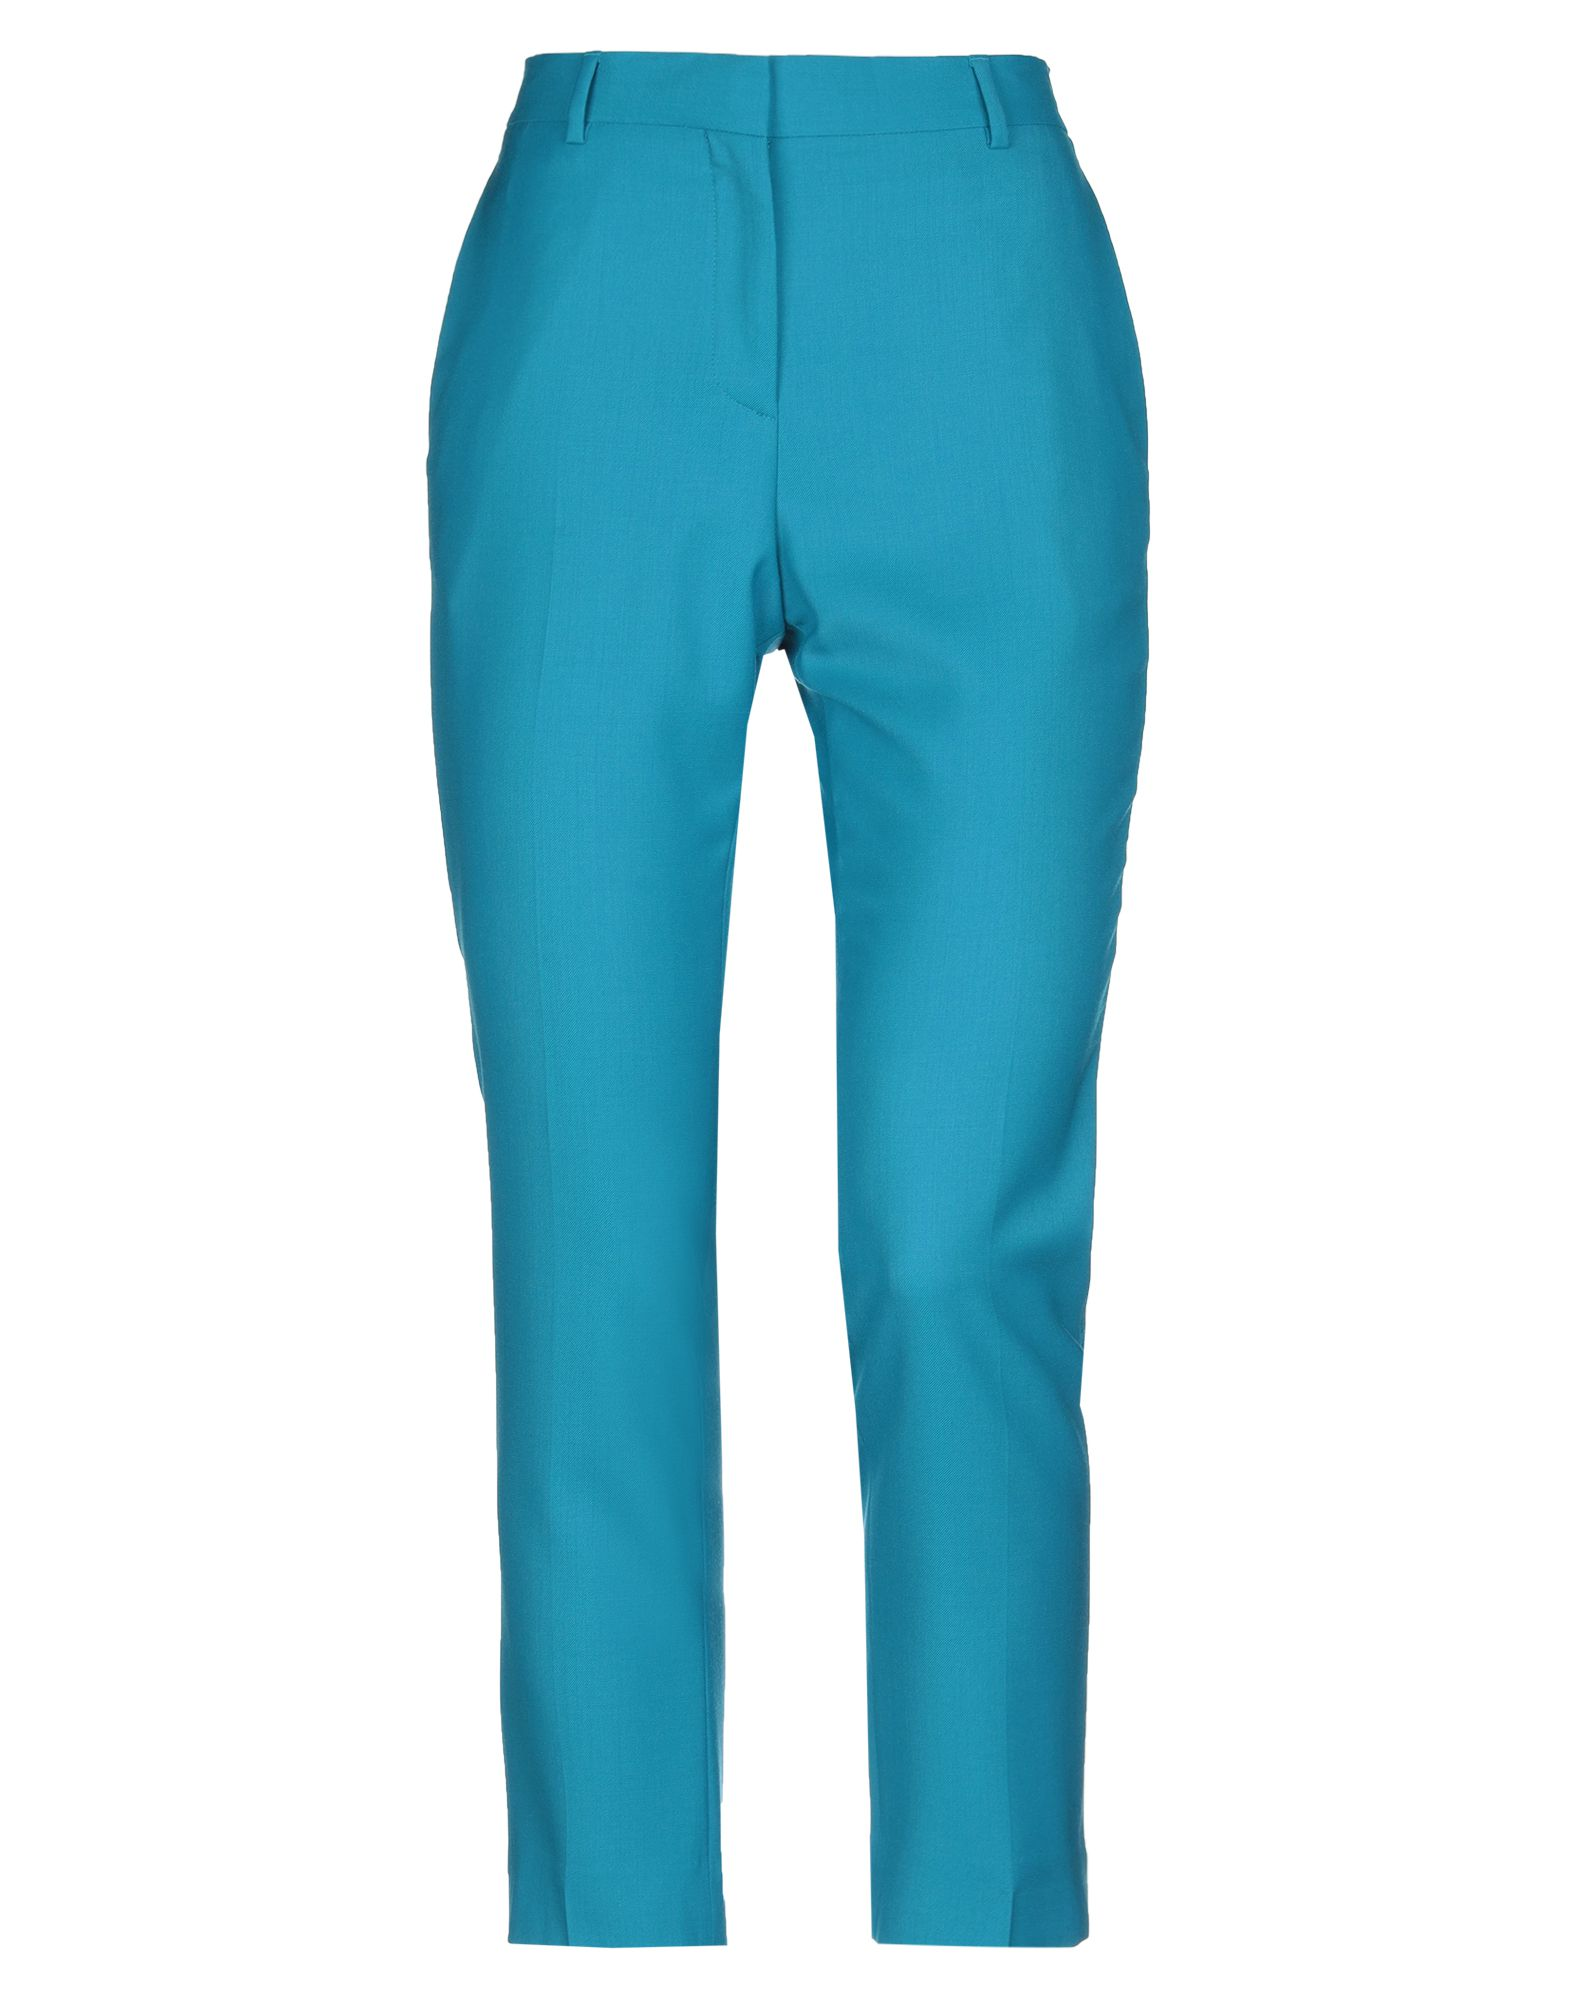 Pantalone Pantalone Pantalone Paul Smith donna - 13368493UO f41